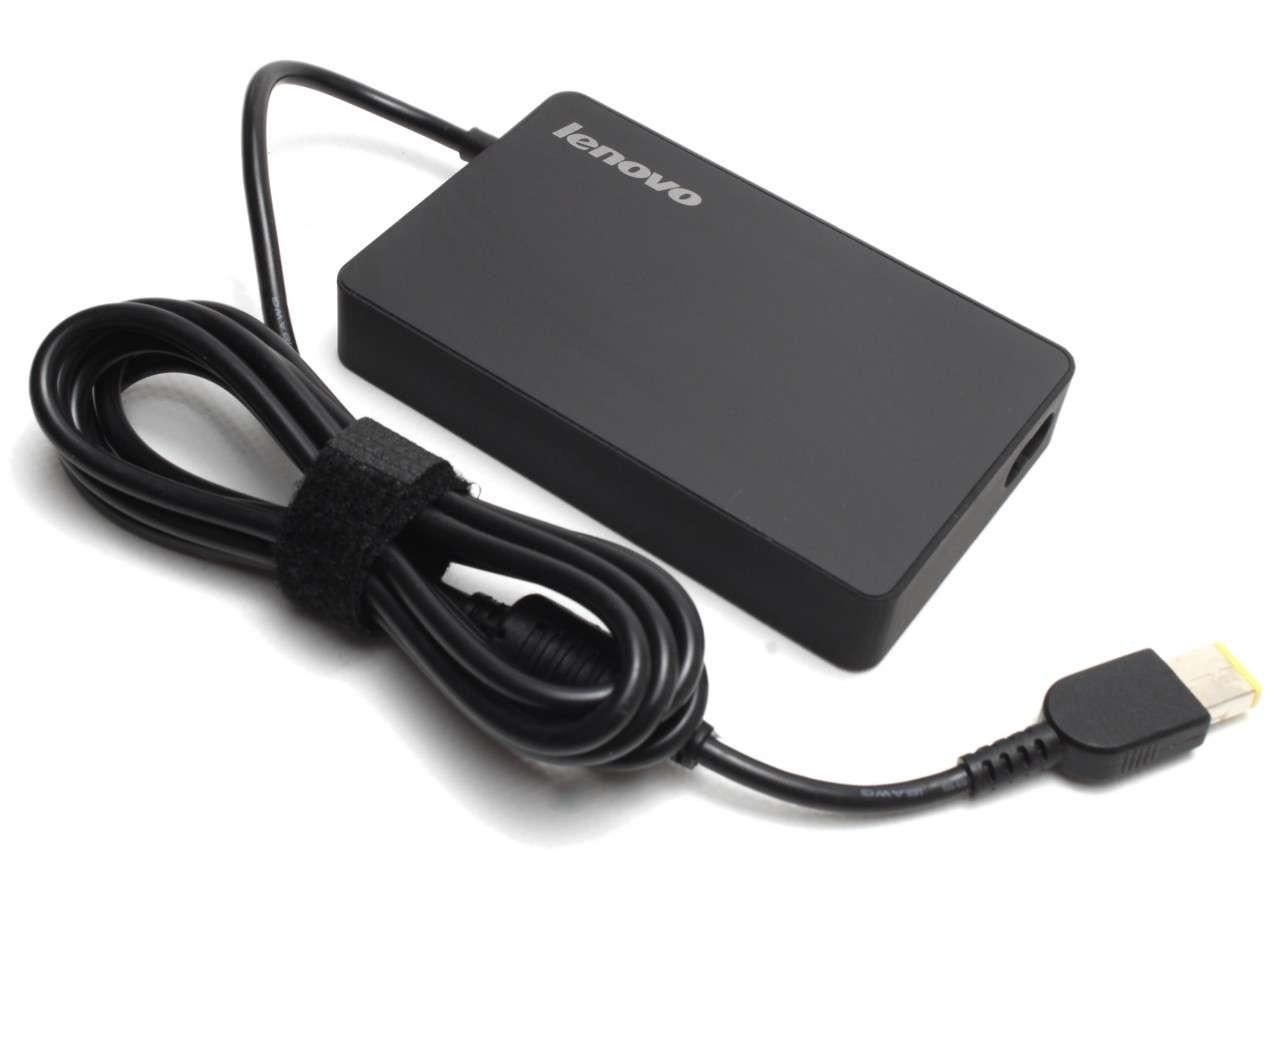 Incarcator Lenovo ThinkPad T450s 65W Slim Version imagine powerlaptop.ro 2021